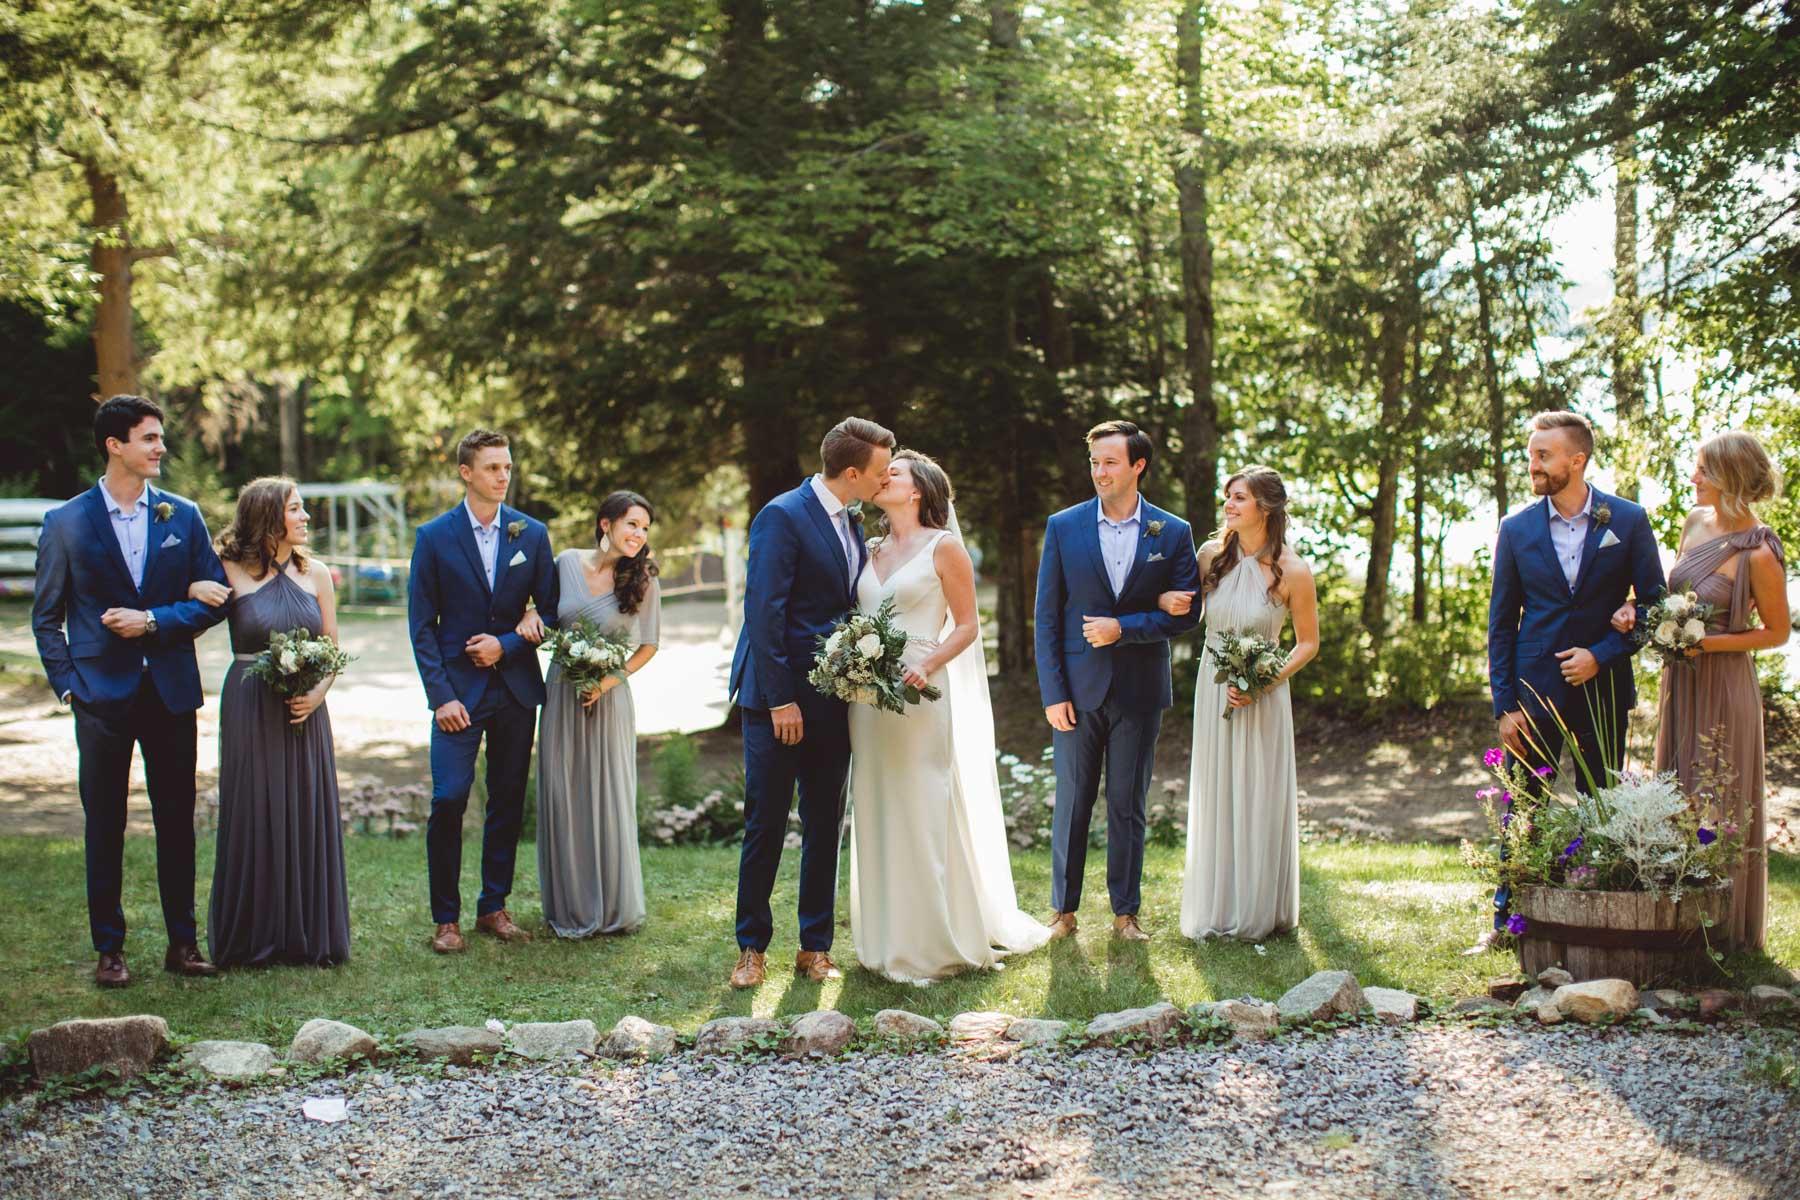 Wedding-Photography-Campground-12.jpg